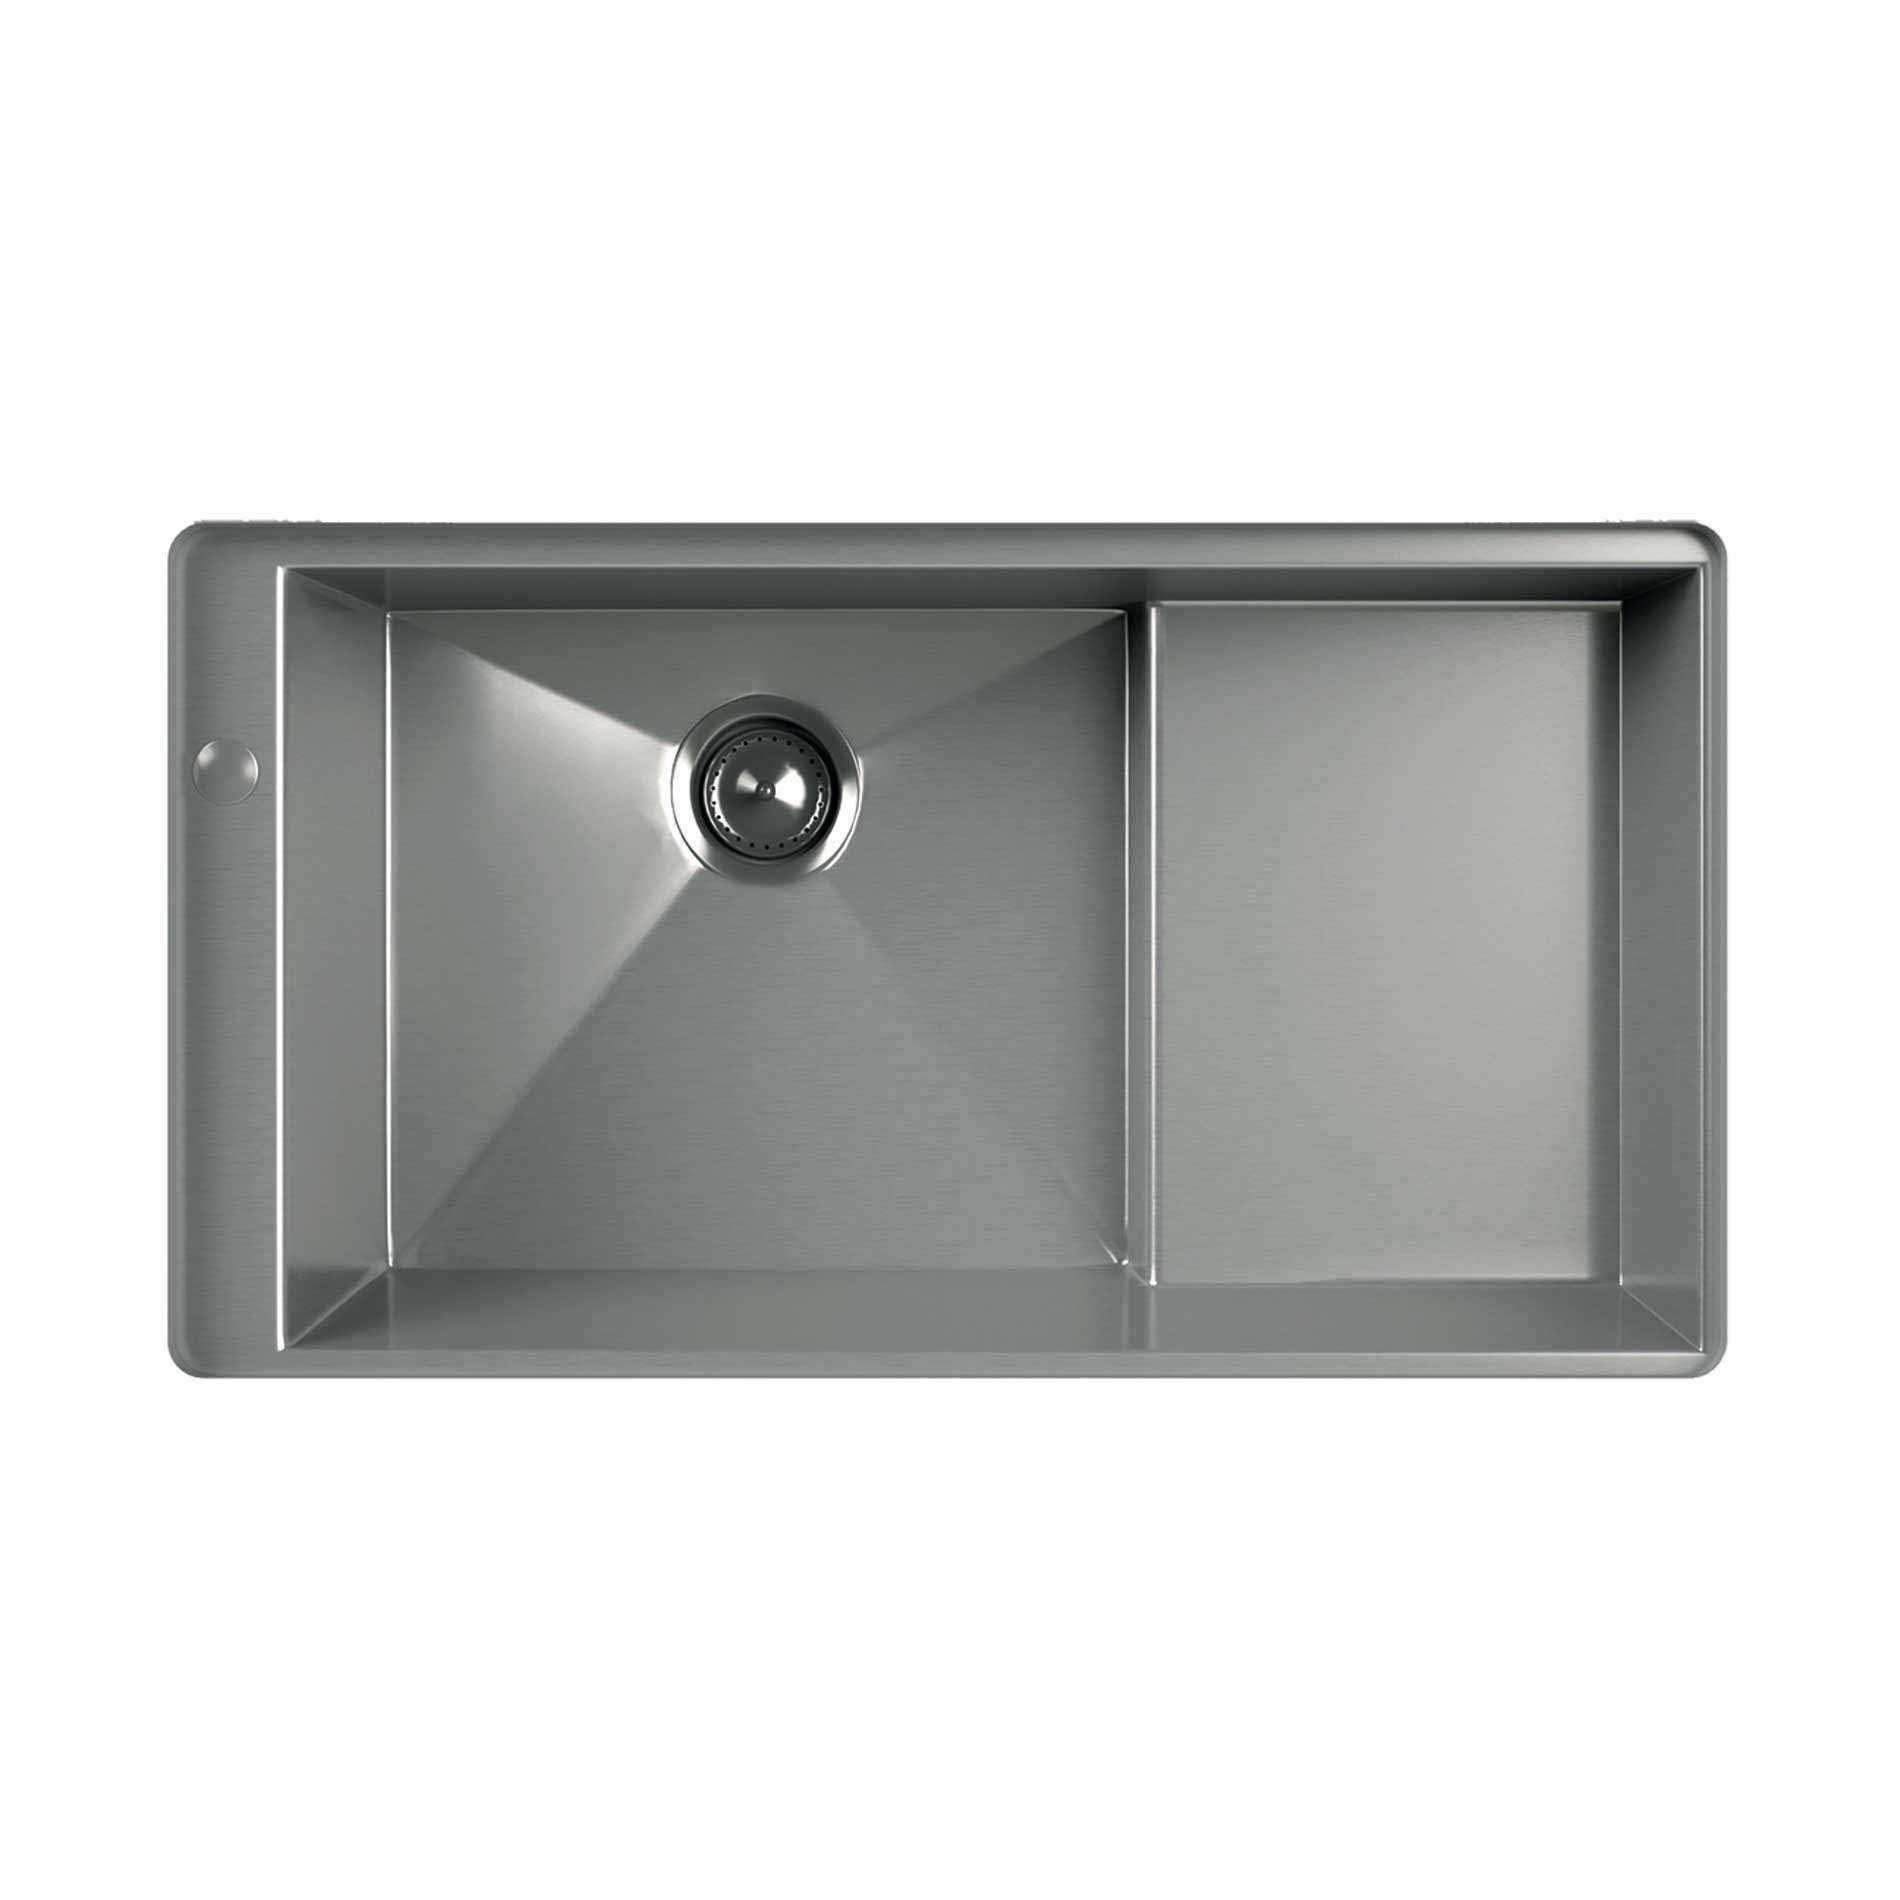 Stainless Steel Sink Manufacturers : Kohler: Geog 1-0 Bowl Stainless Steel Sink - Kitchen Sinks & Taps